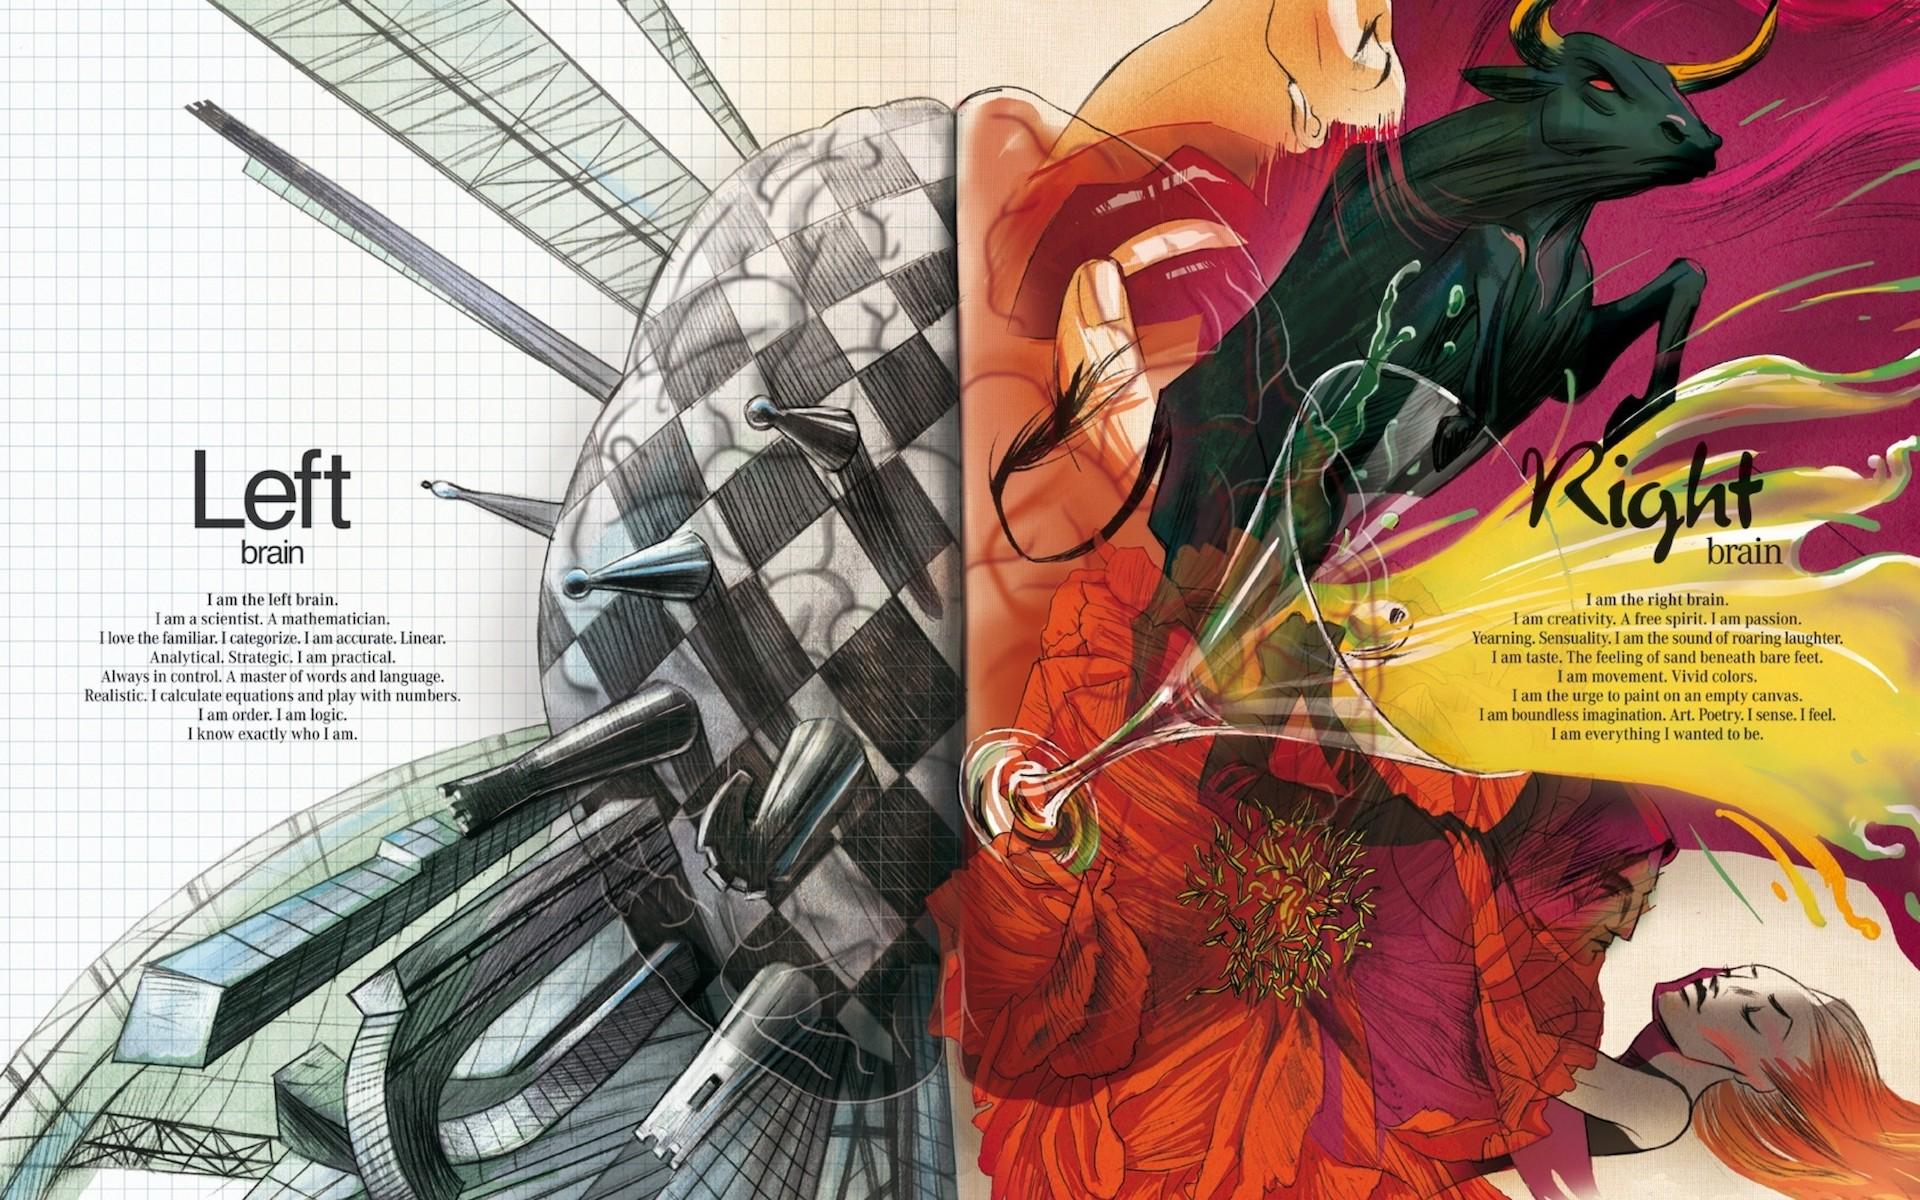 Abstract_multicolor_brain_artwork_2560x1600 15.31.32.jpg